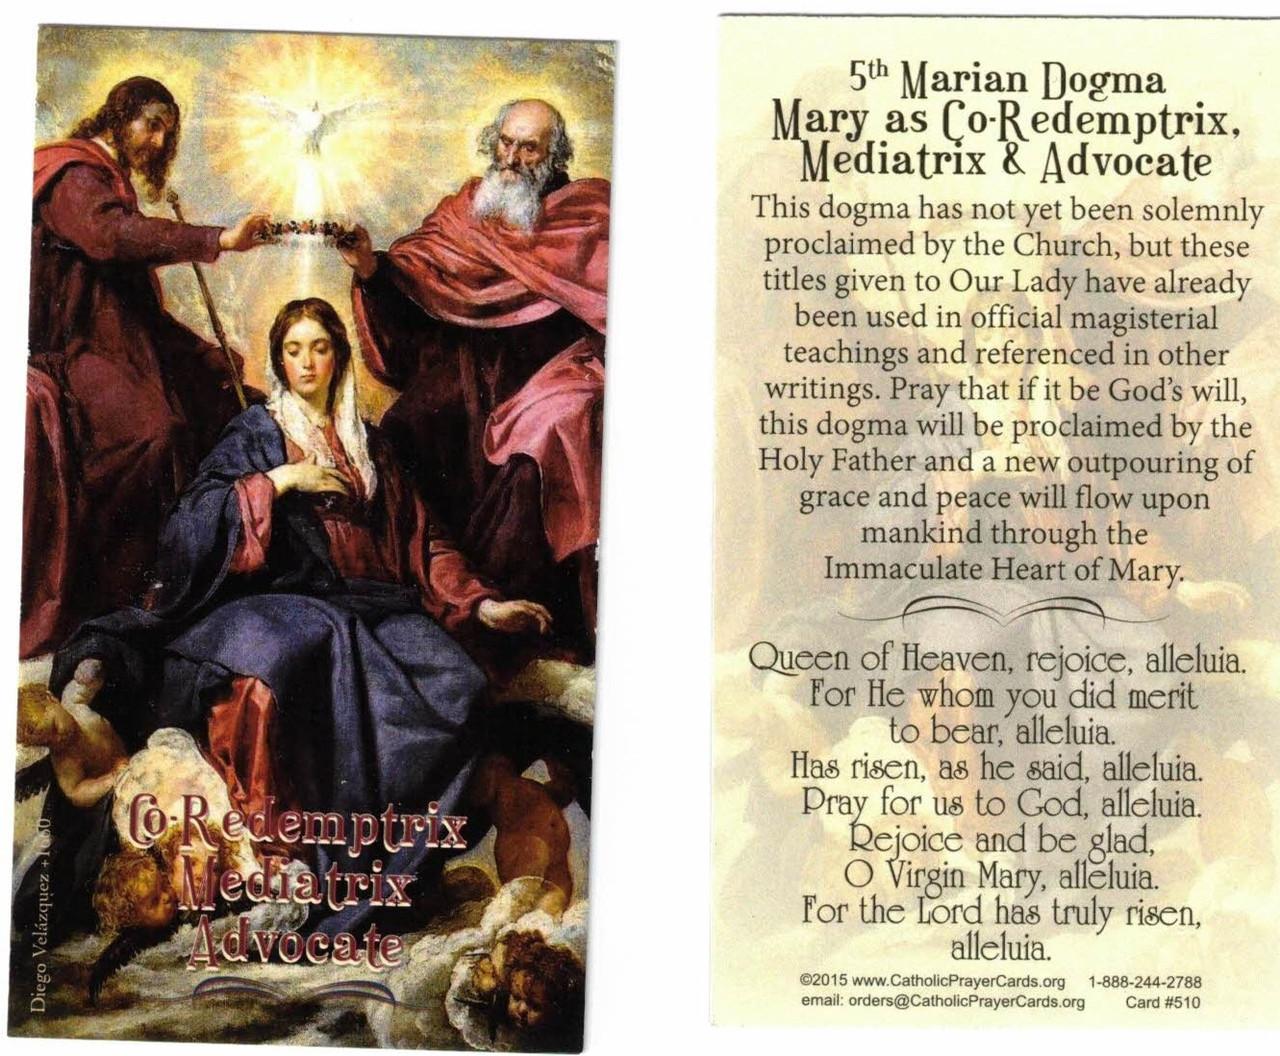 Fifth Marian Dogma--Mary Mediatrix. Co-Redemptrix, Advocate